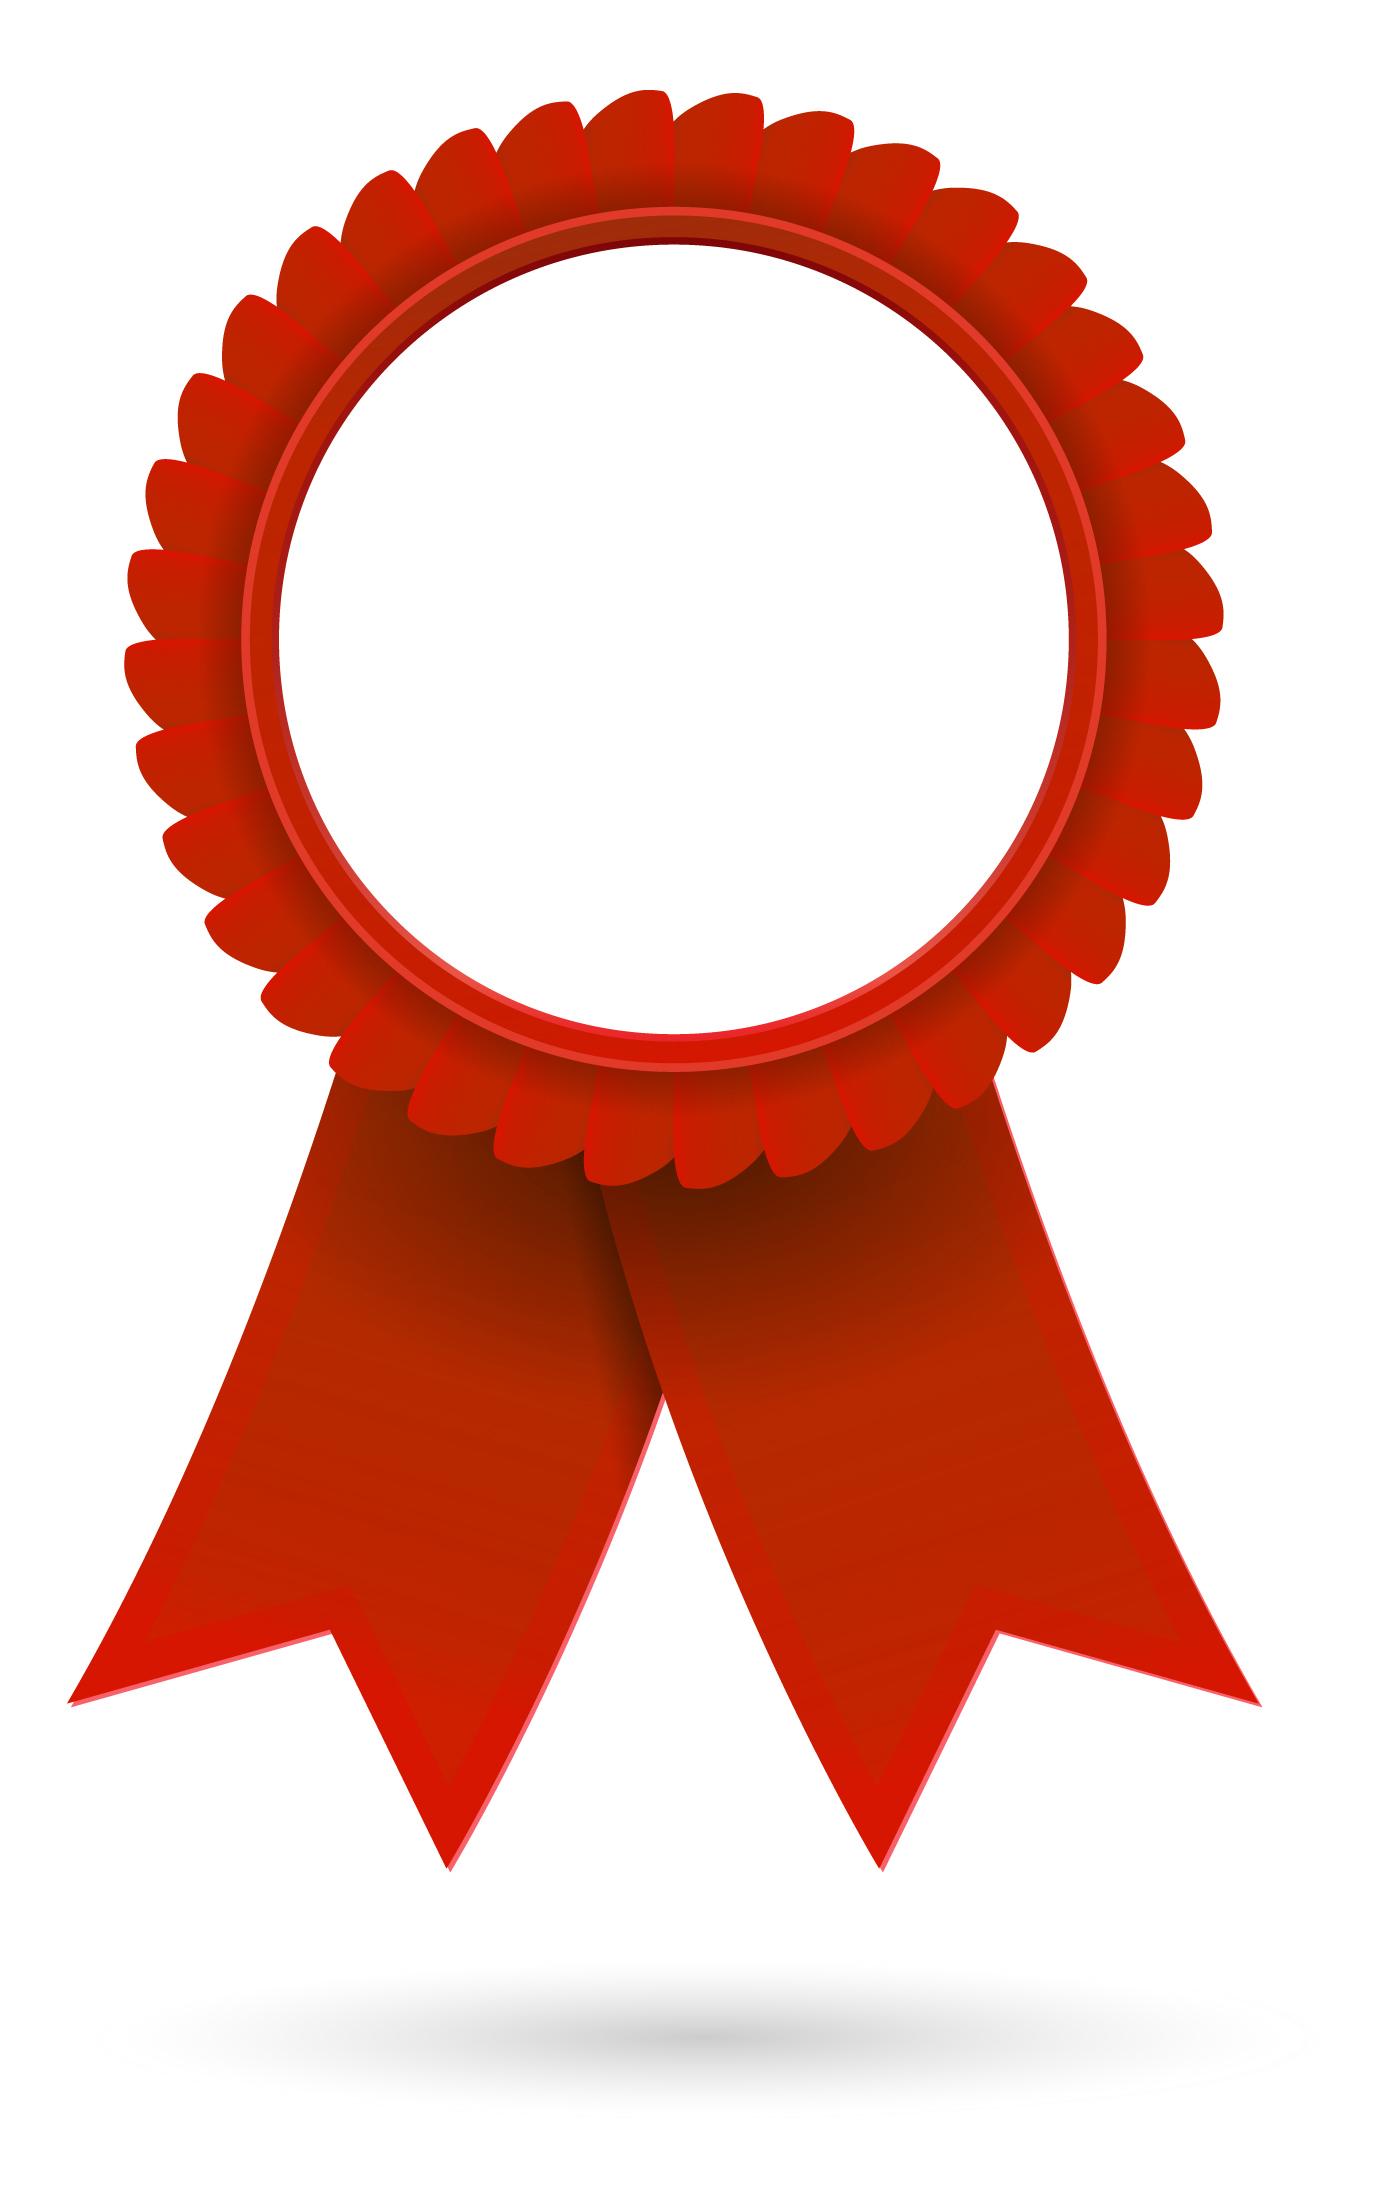 Red Ribbon Pics Clipart Best-Red Ribbon Pics Clipart Best-7